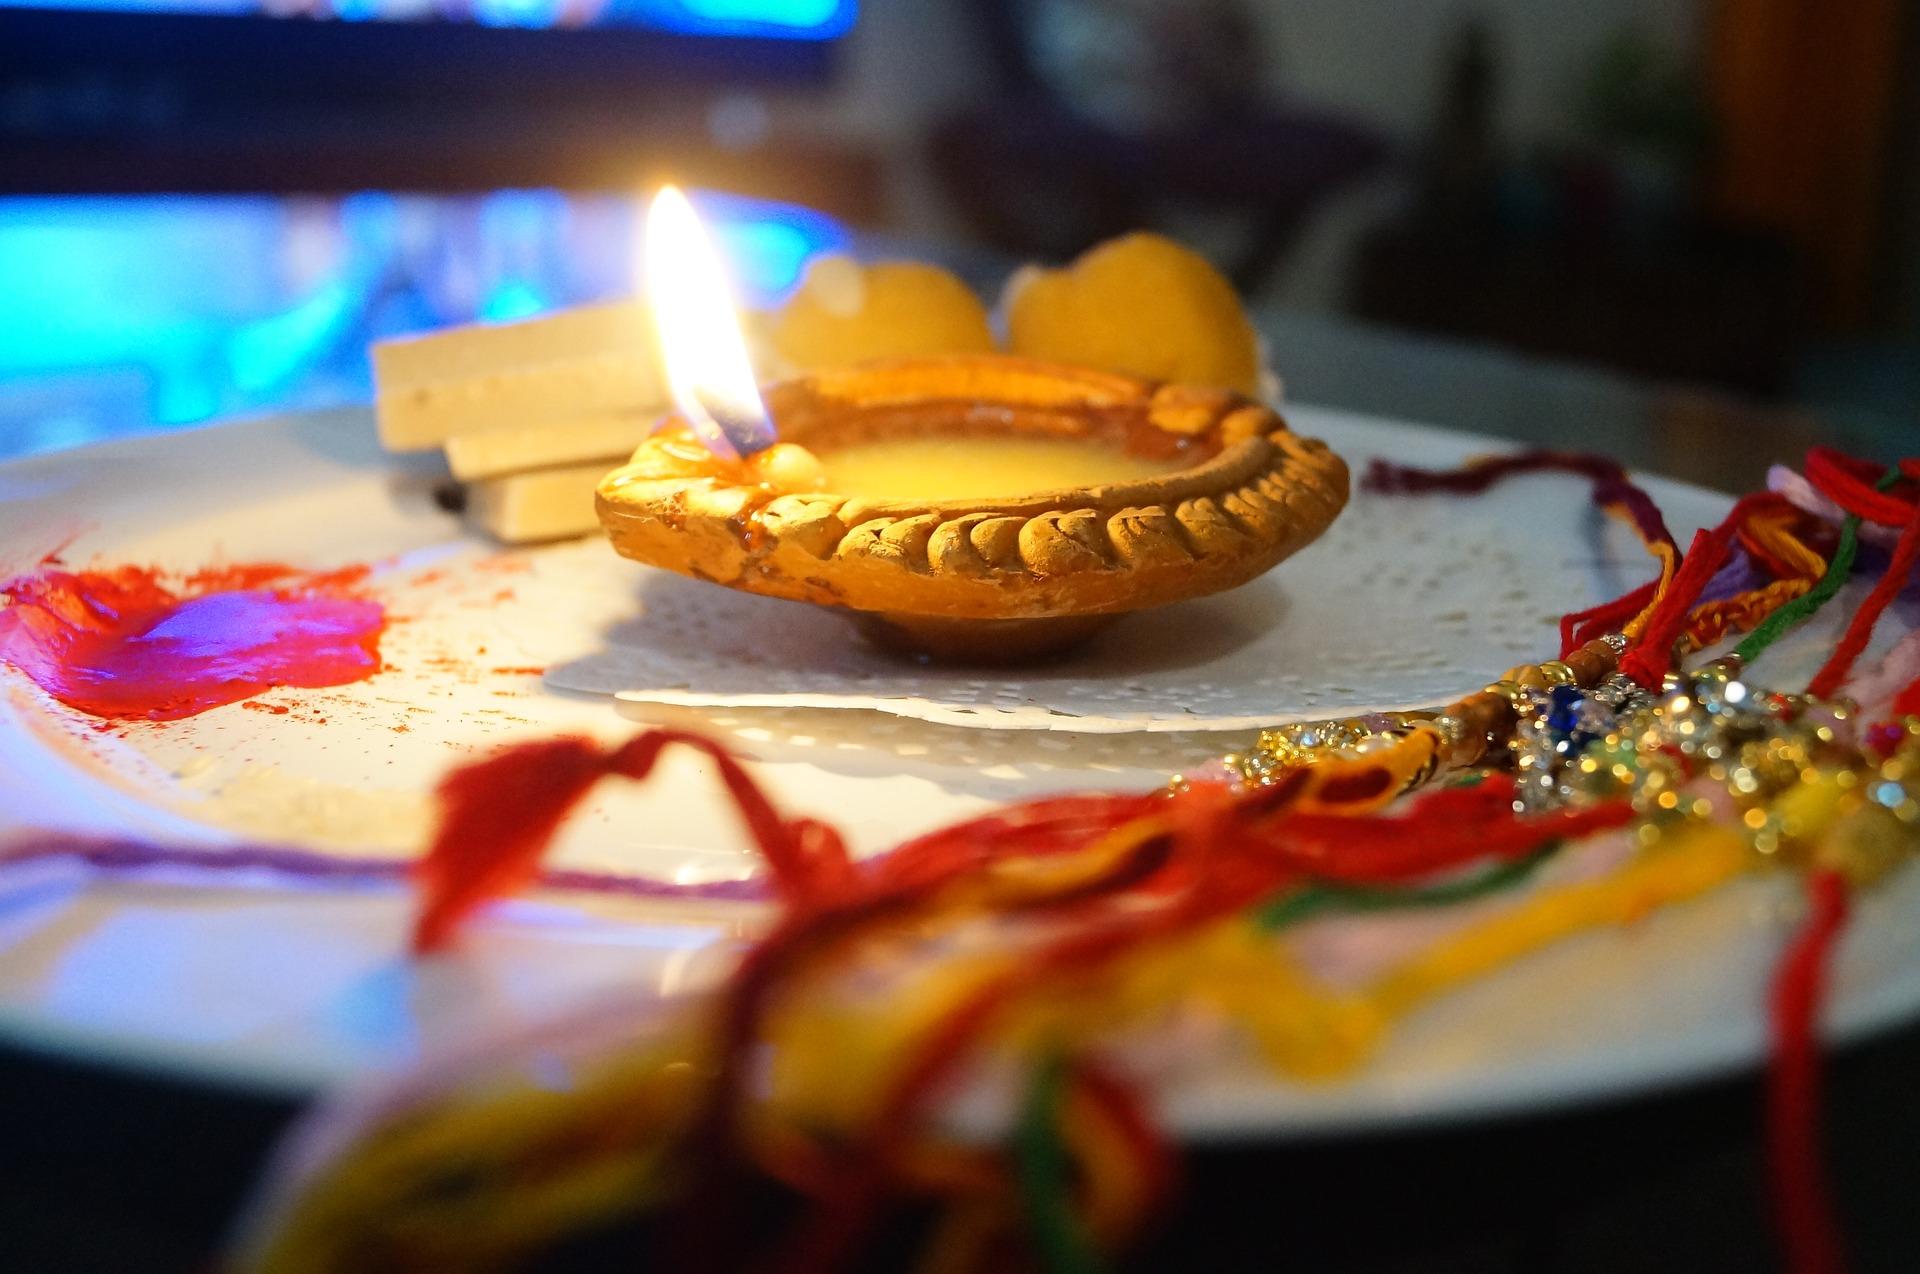 Top Wondrous Rakhi Gift Ideas to Enchant Your Dear Brother